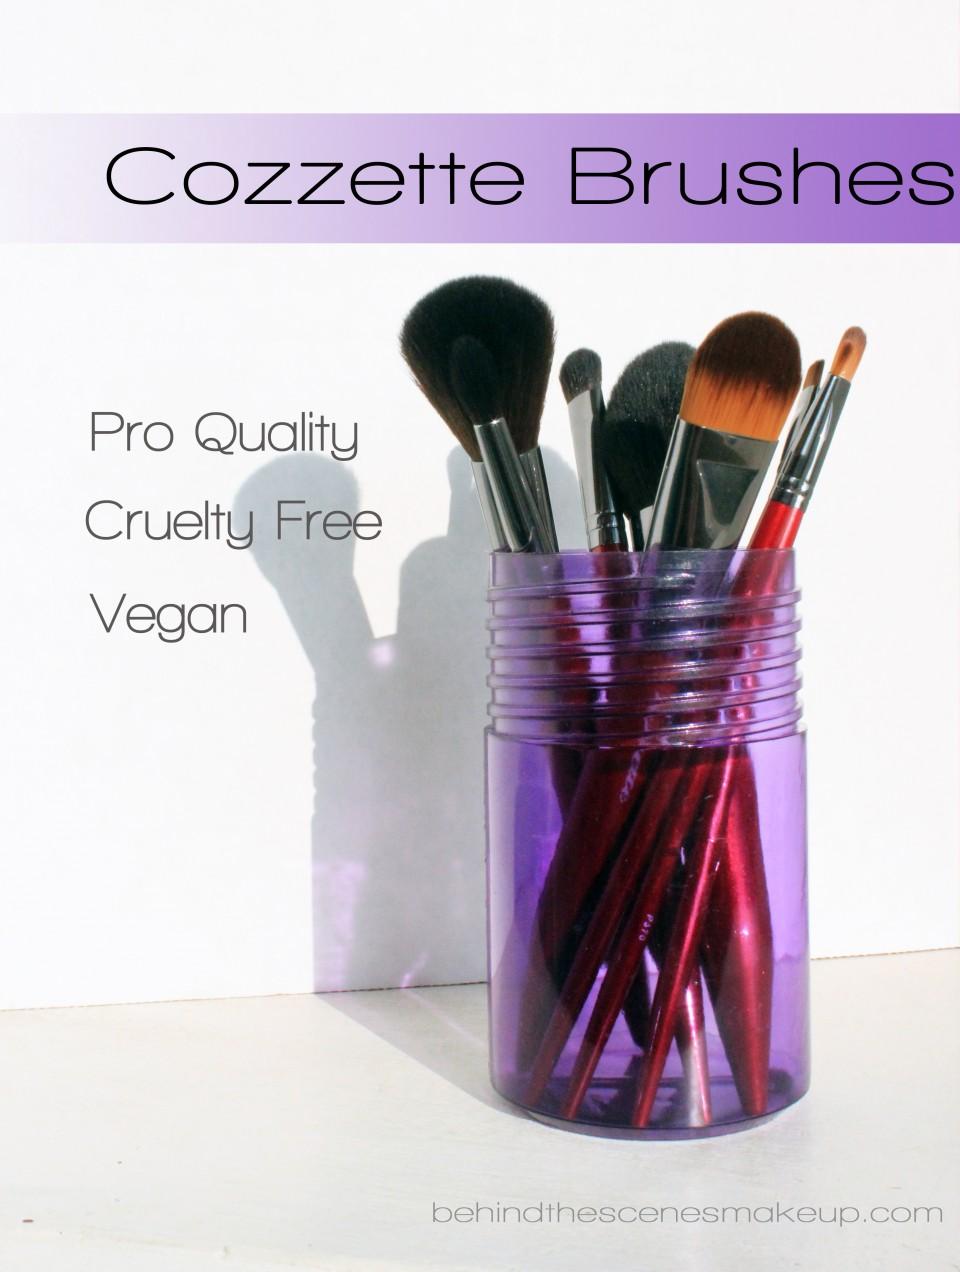 Cozette Brush Review